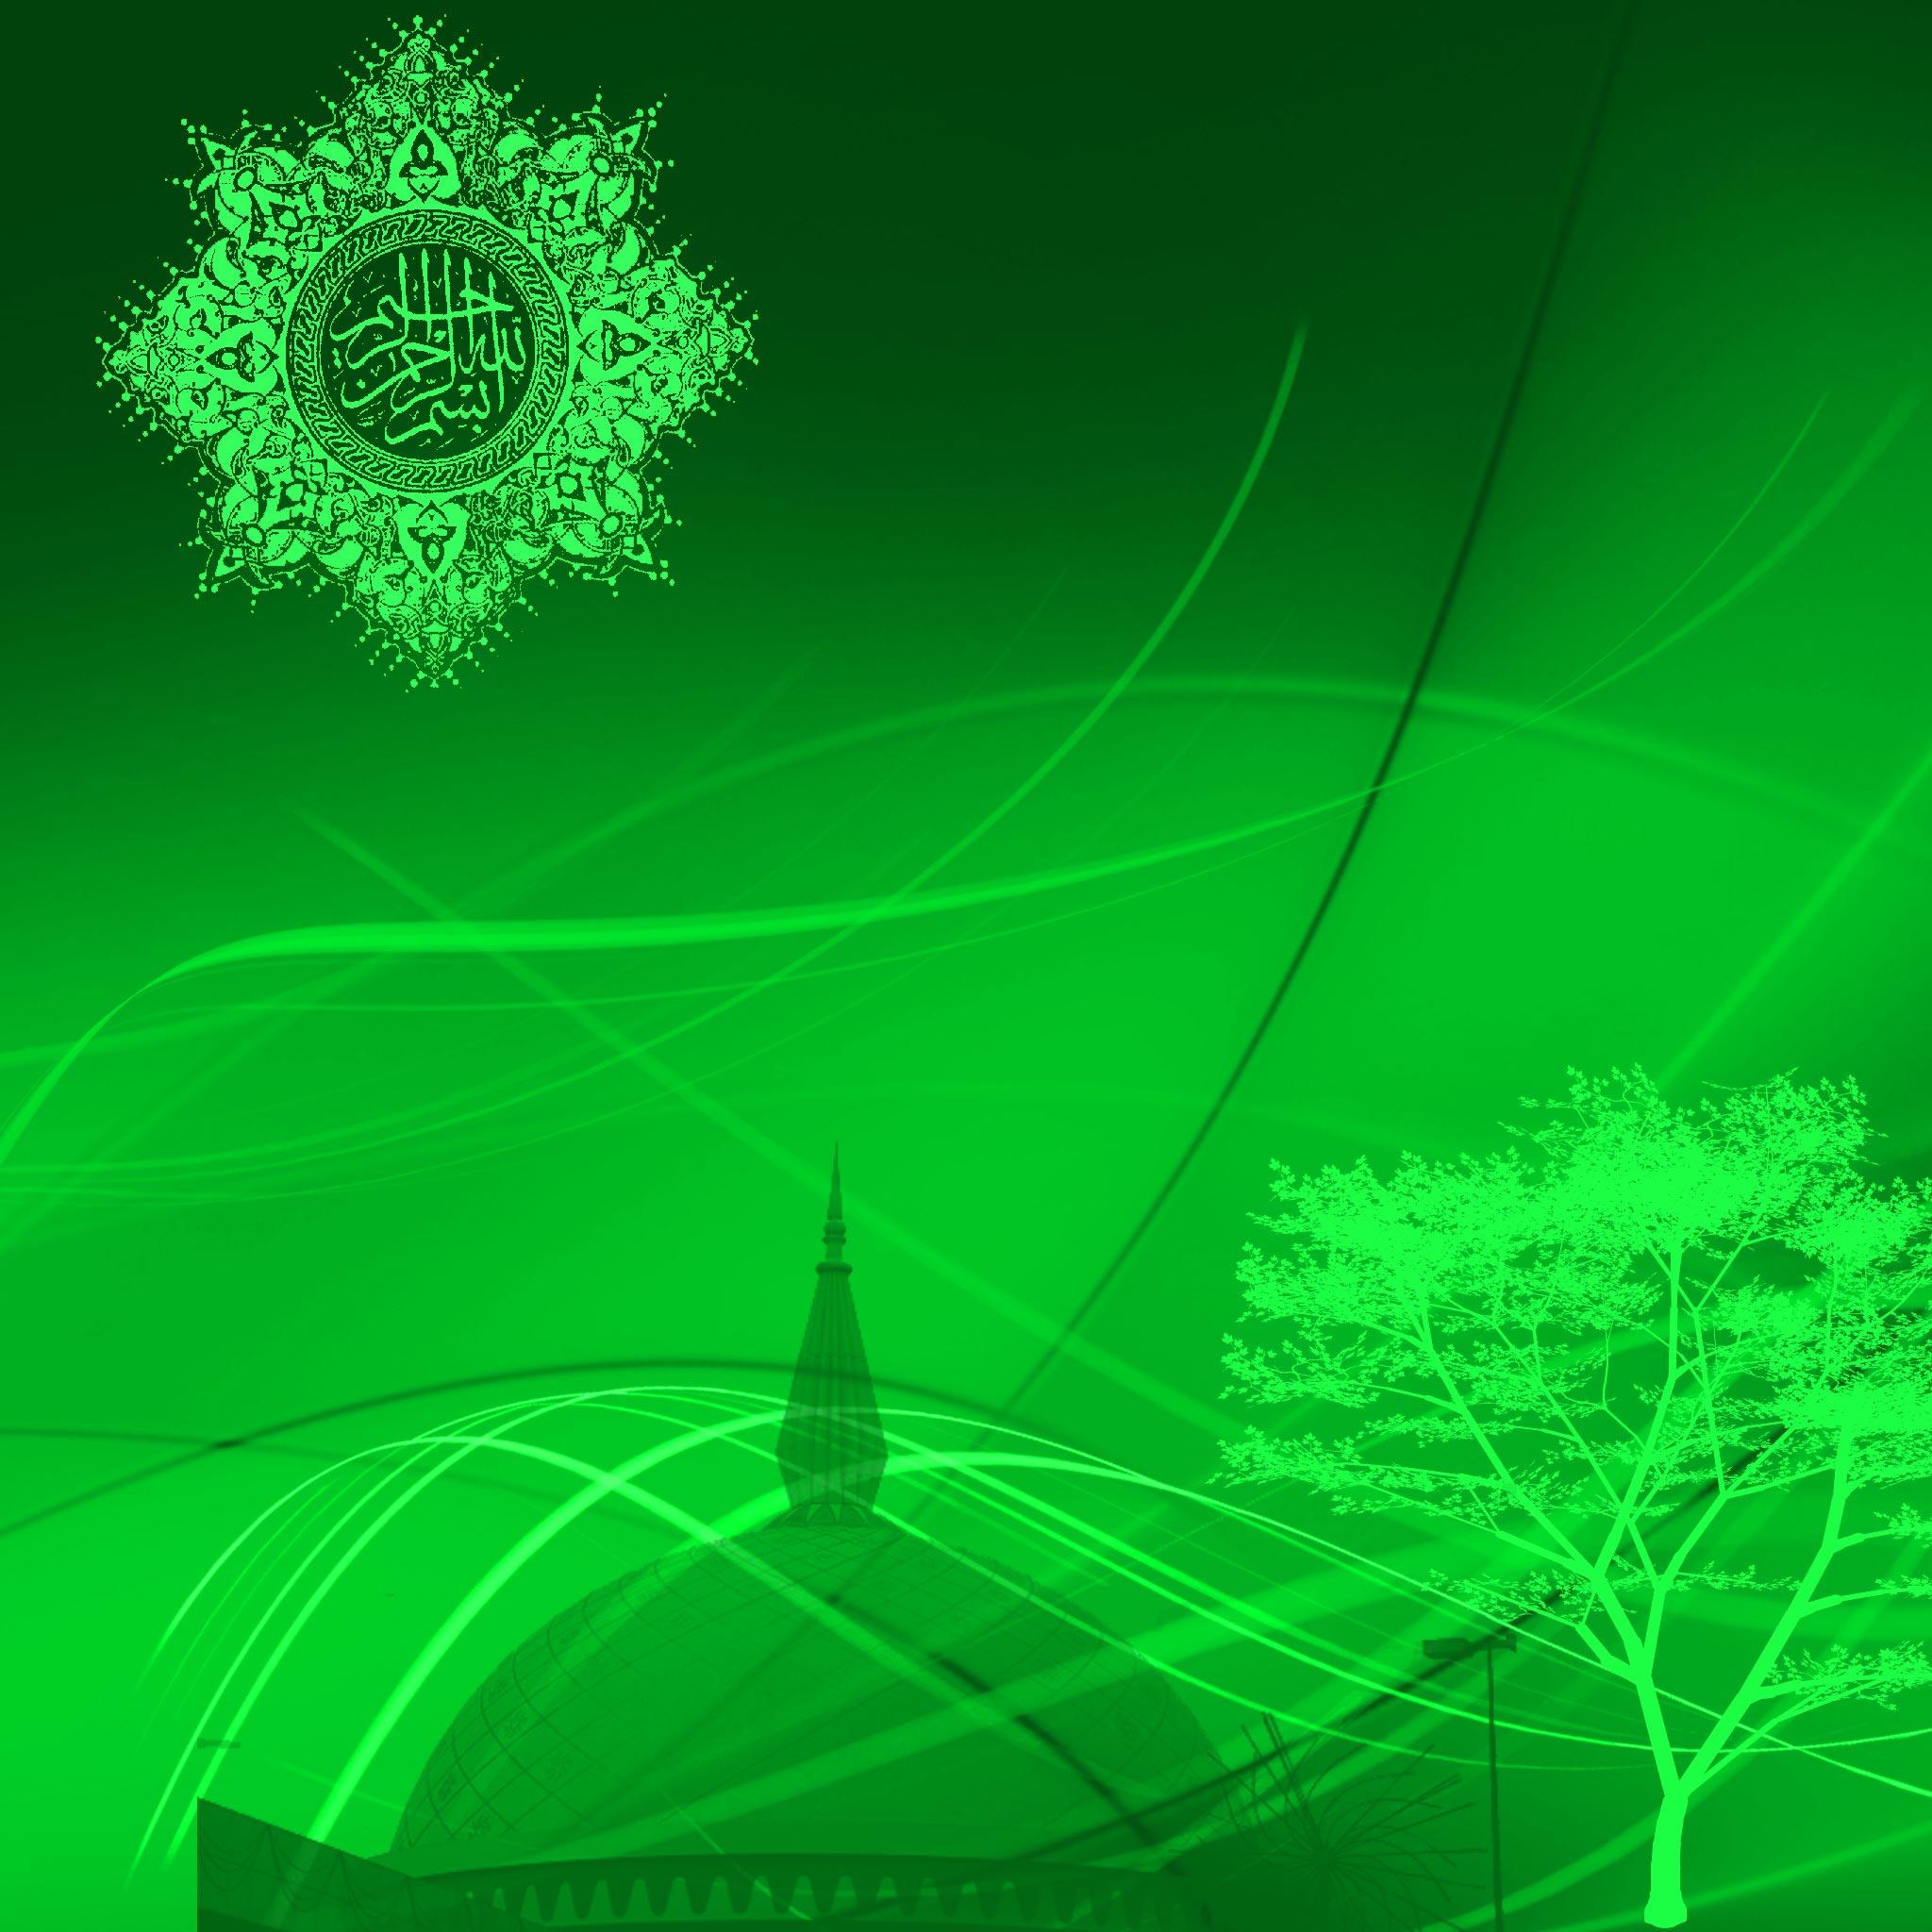 Free Download Ipad 3 Islamic Wallpaper 2 Islamic Apps